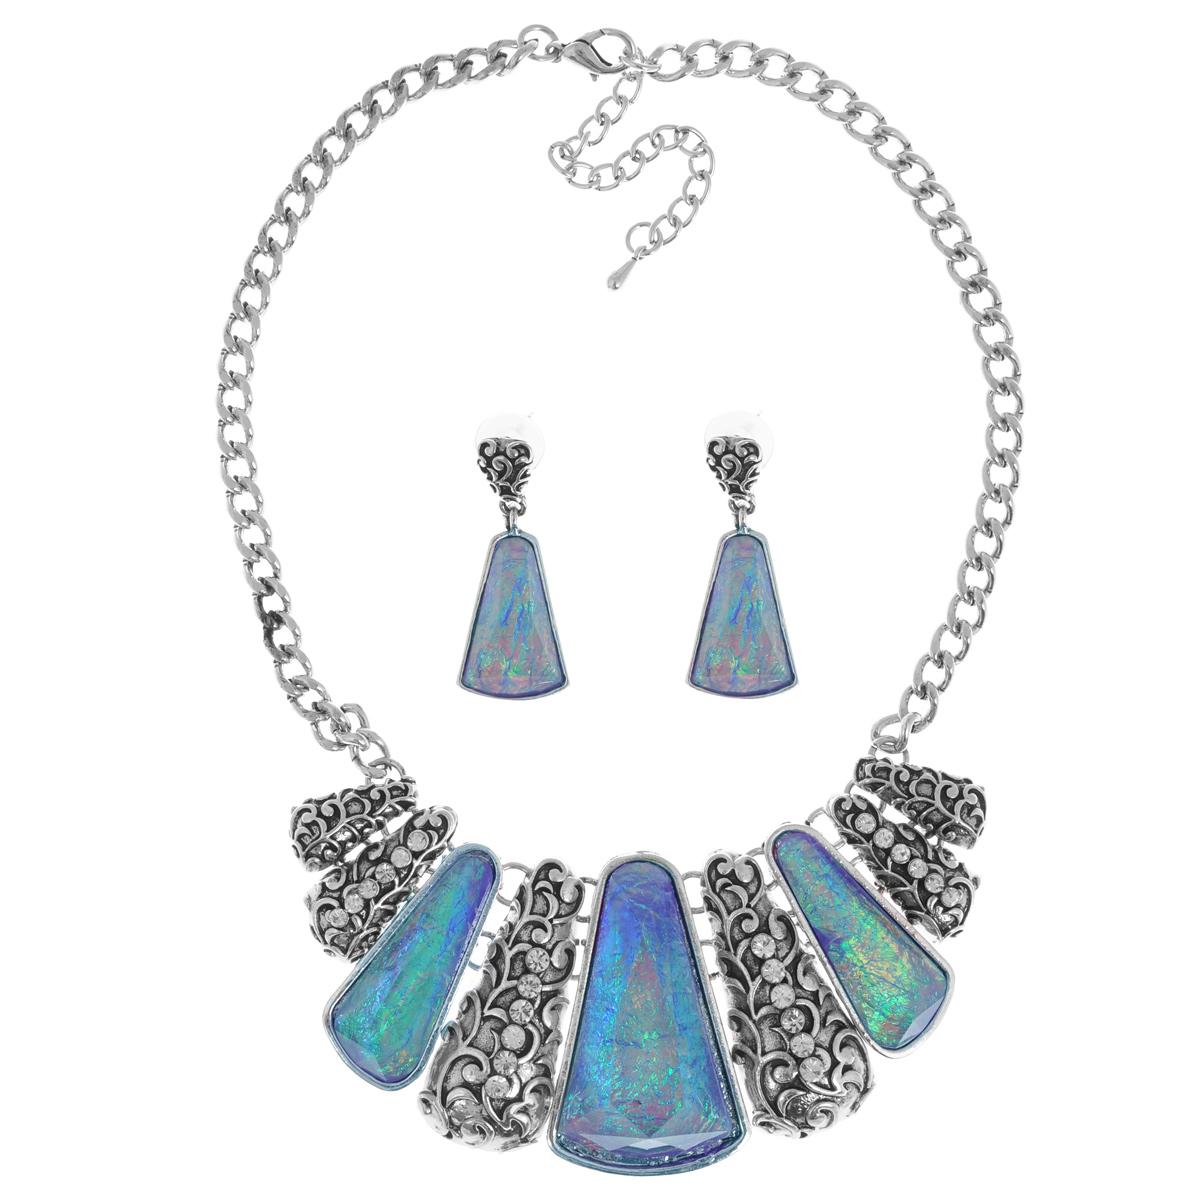 Комплект украшений Taya: колье, серьги, цвет: мультиколор, синий. T-B-9271